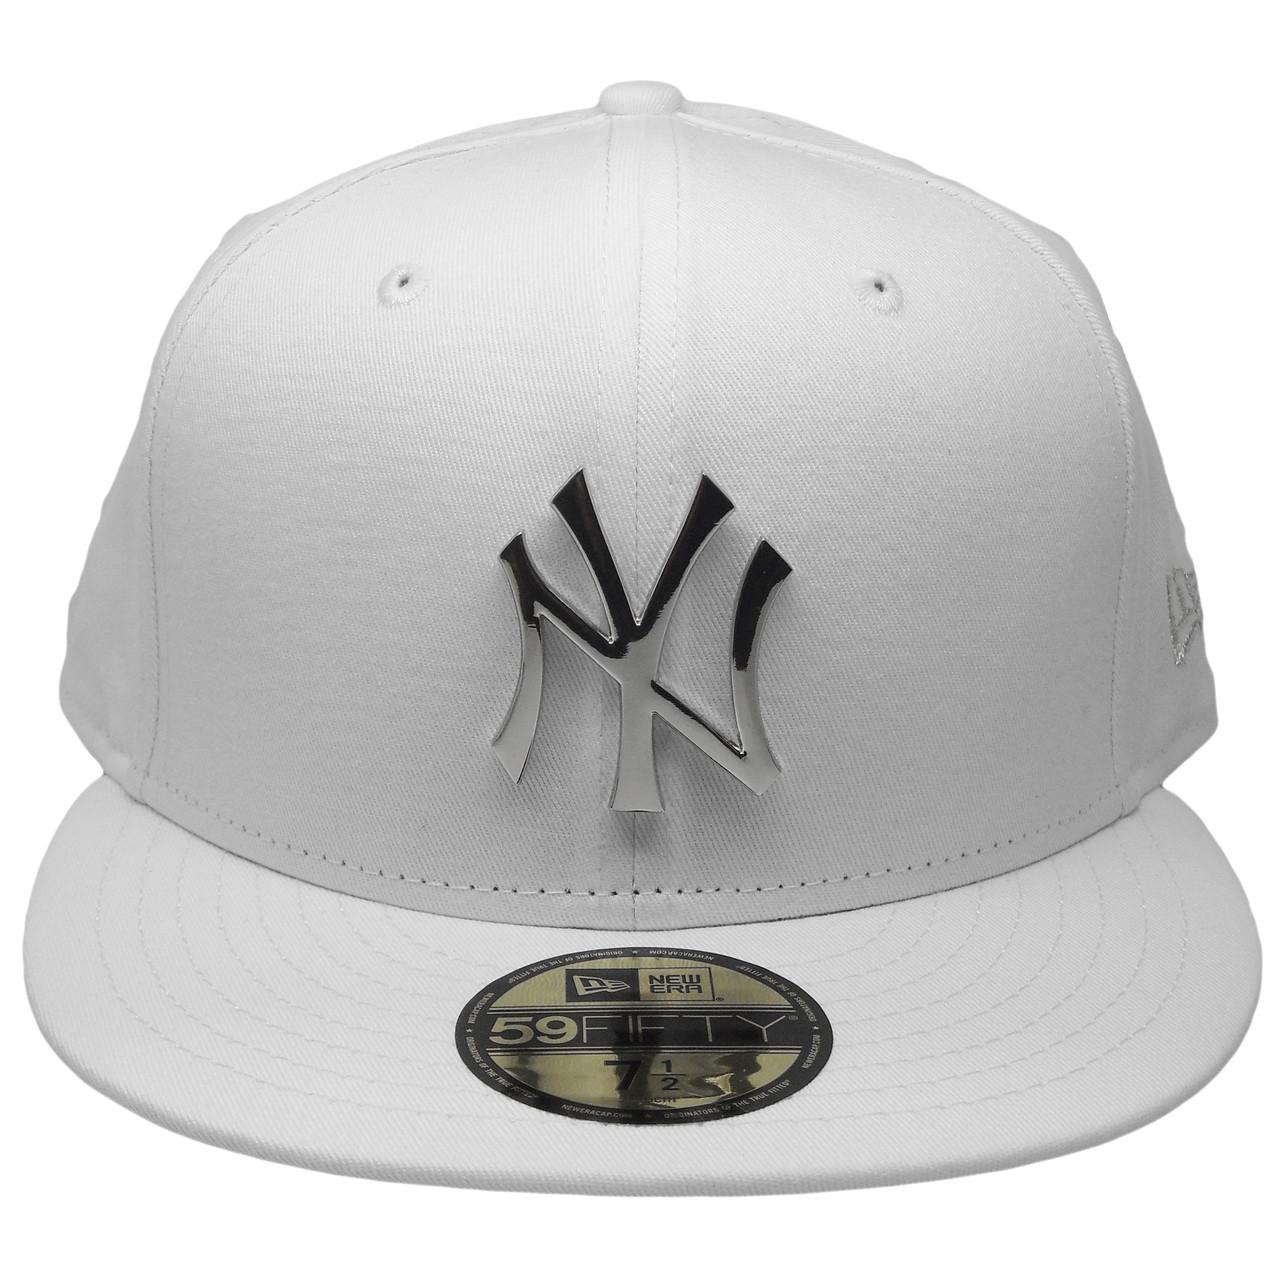 75c8841593de0 New York Yankees New Era Custom 59Fifty Fitted Hat - White